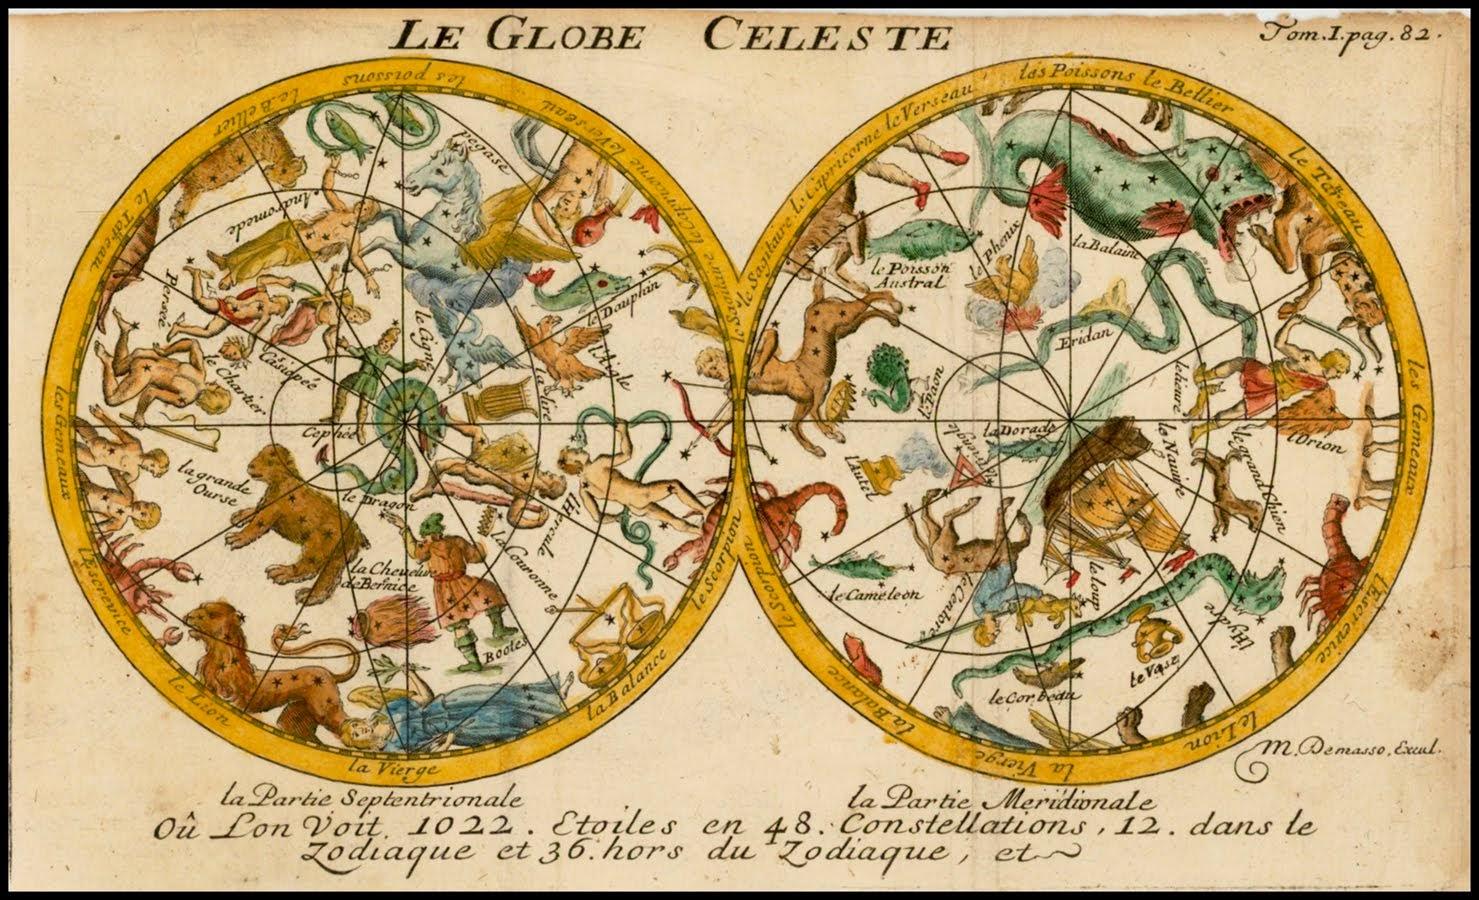 Title: Le Globe Celeste   Map Maker: Pherotee De La Croix